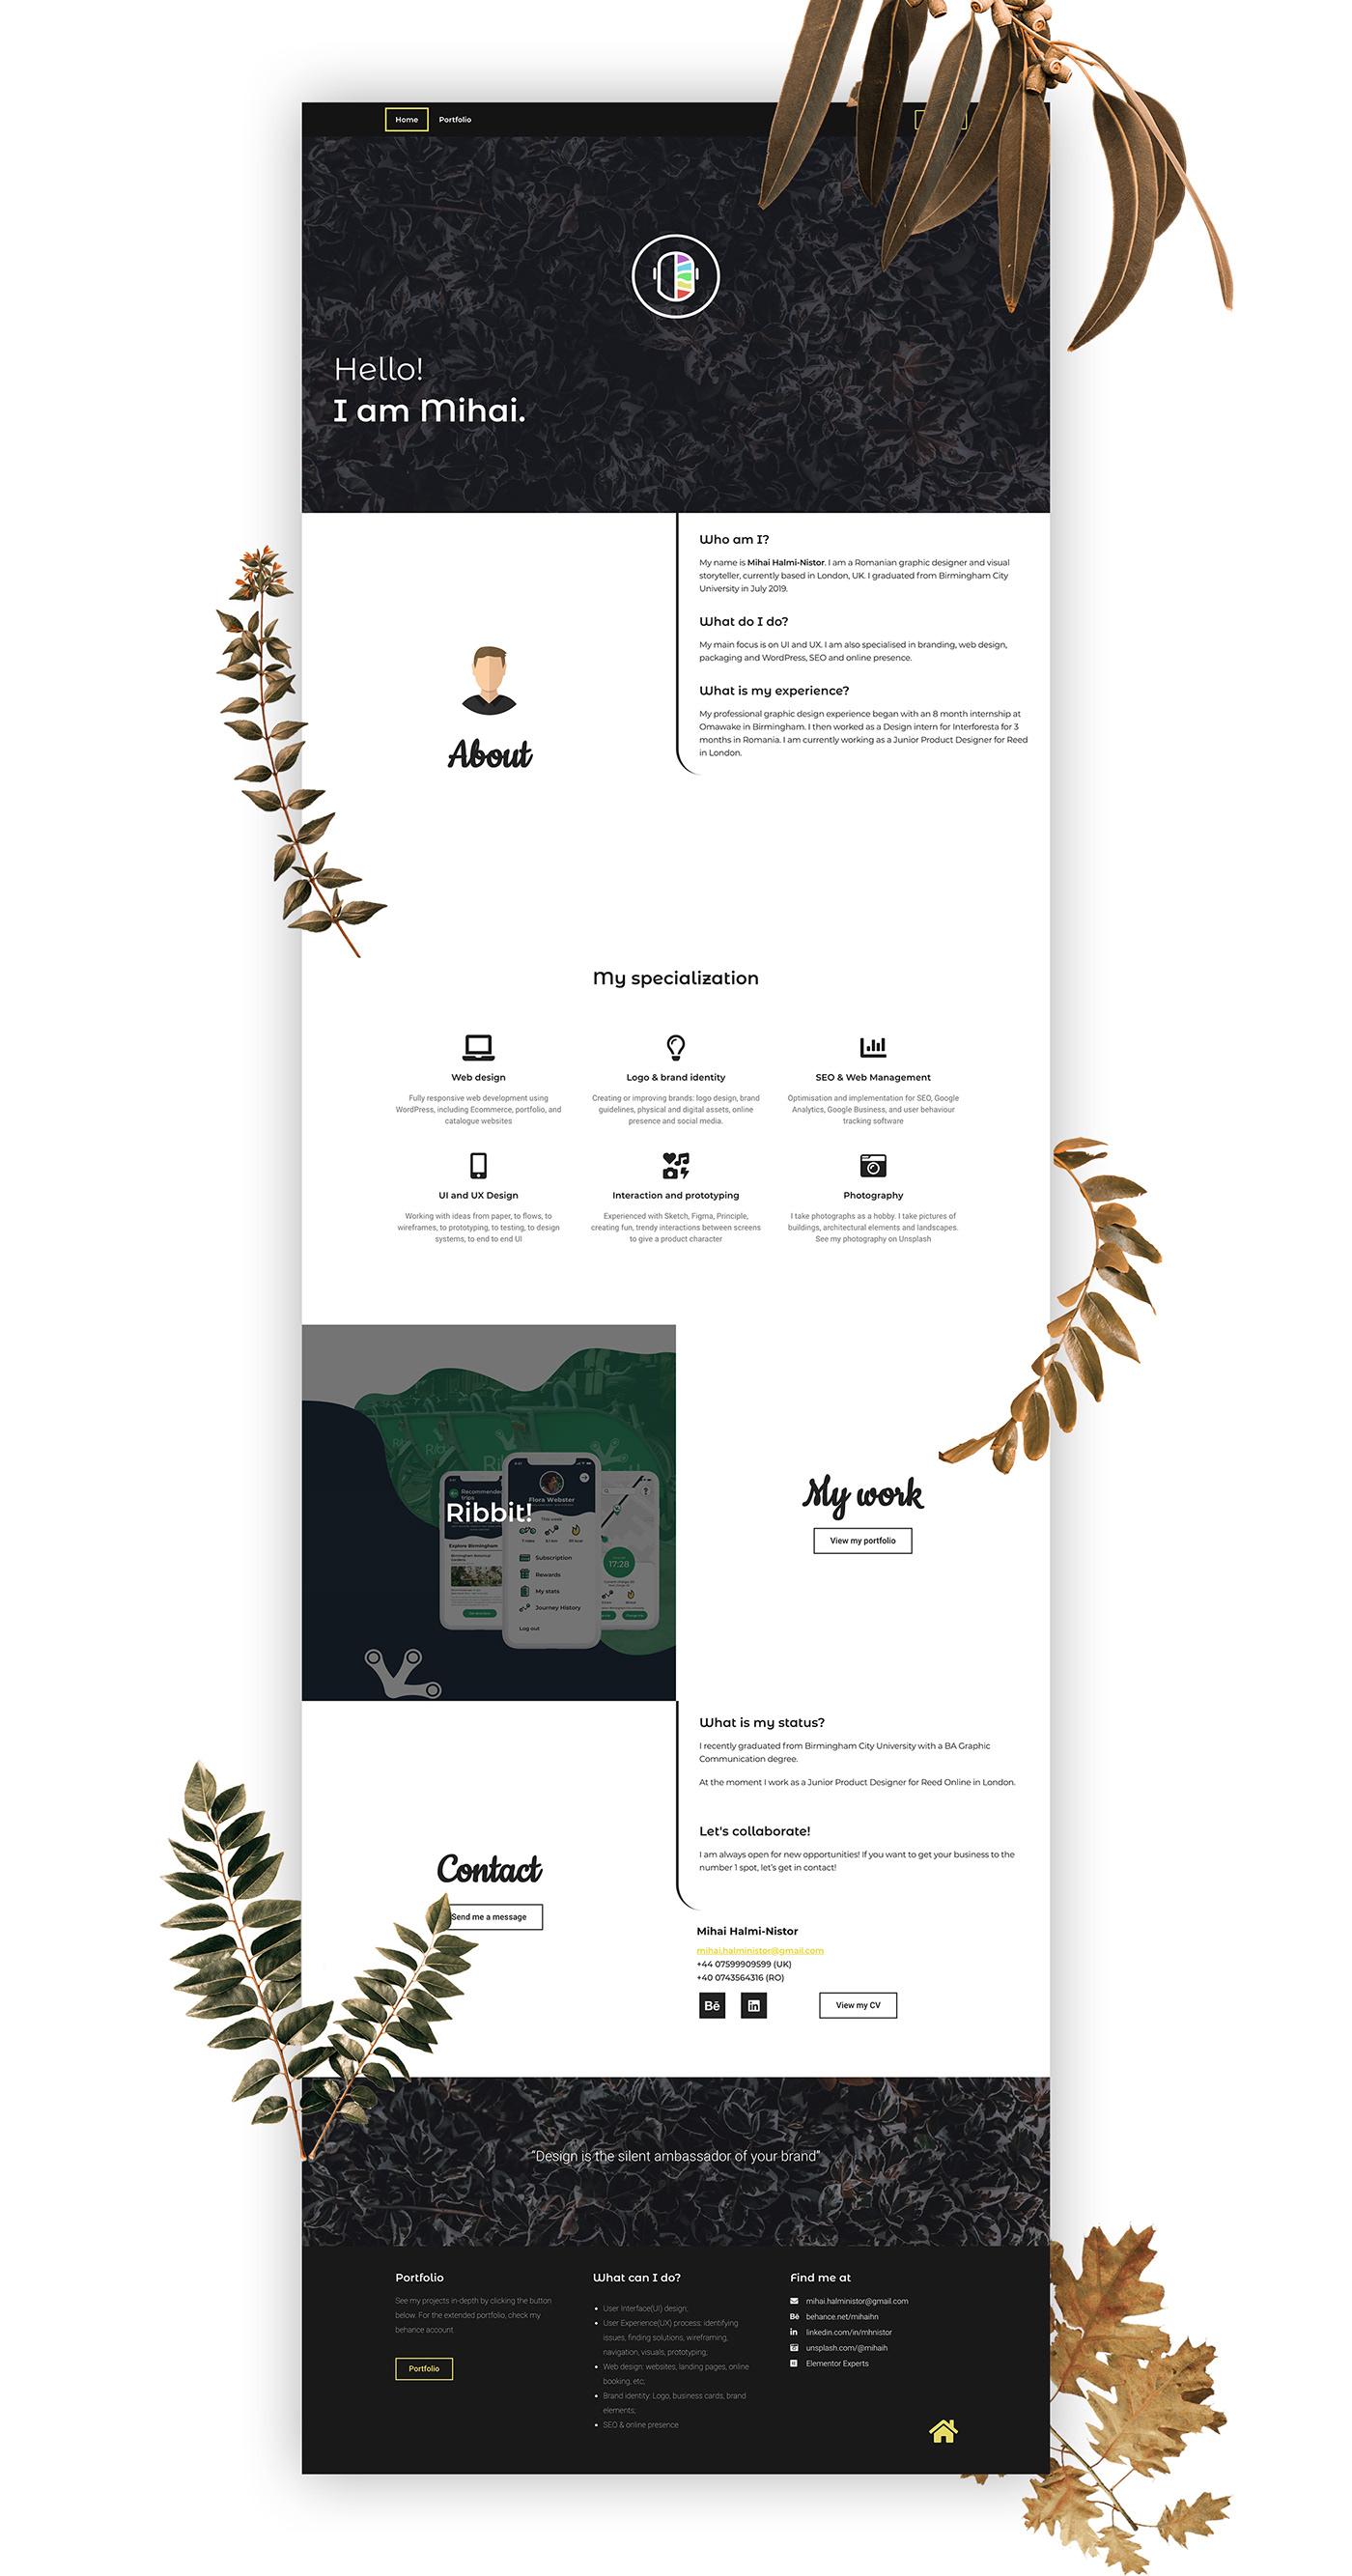 branding ,personal,Webdesign,UI/UX,Website,Personal Brand,personal site,sketch,prototype